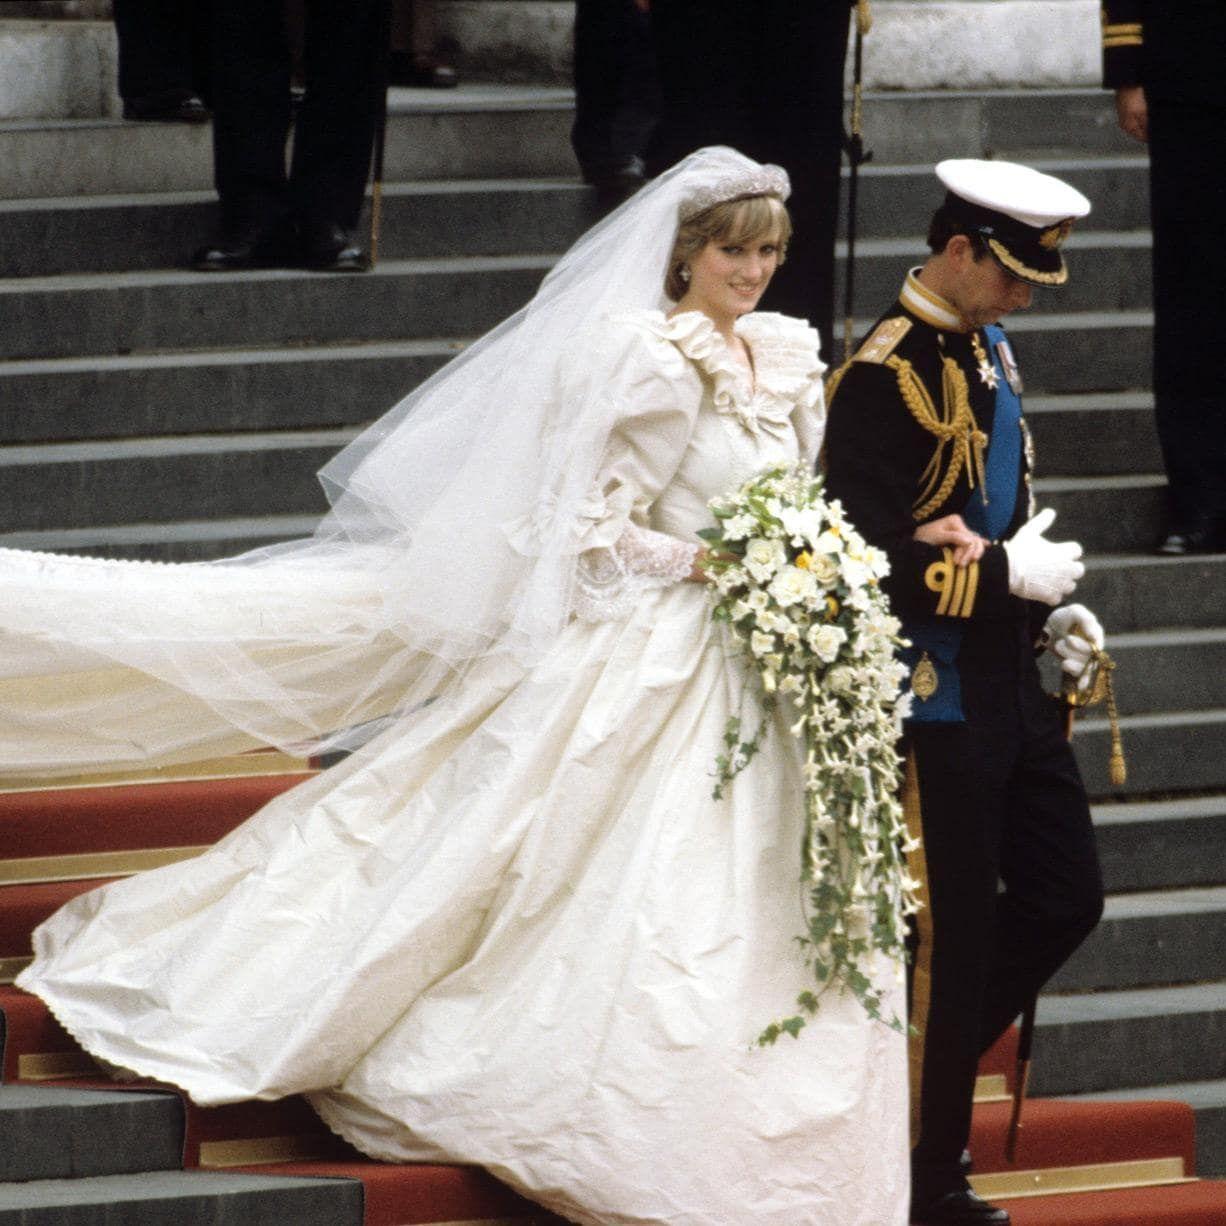 Royal Wedding Dresses Through The Years Princess Diana Wedding Dress Princess Diana Wedding Royal Wedding Dress [ 1226 x 1226 Pixel ]